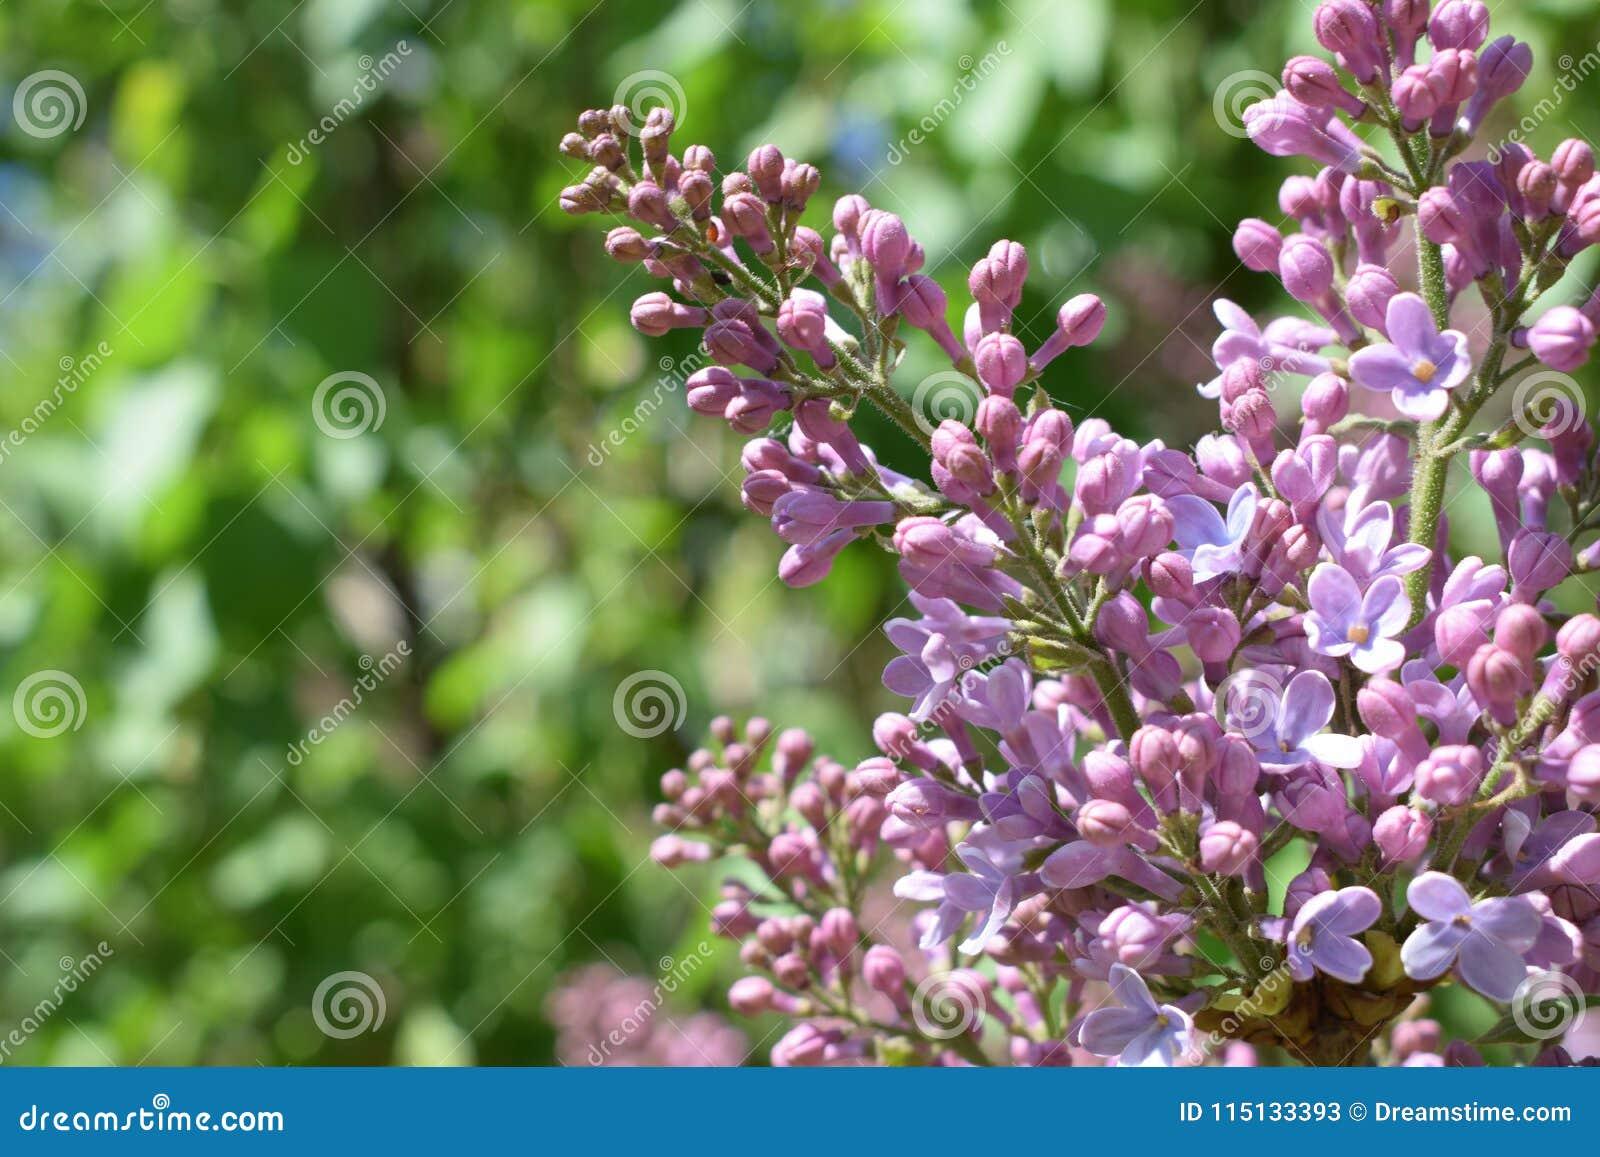 Purple lilac. spring mood. morning beauty